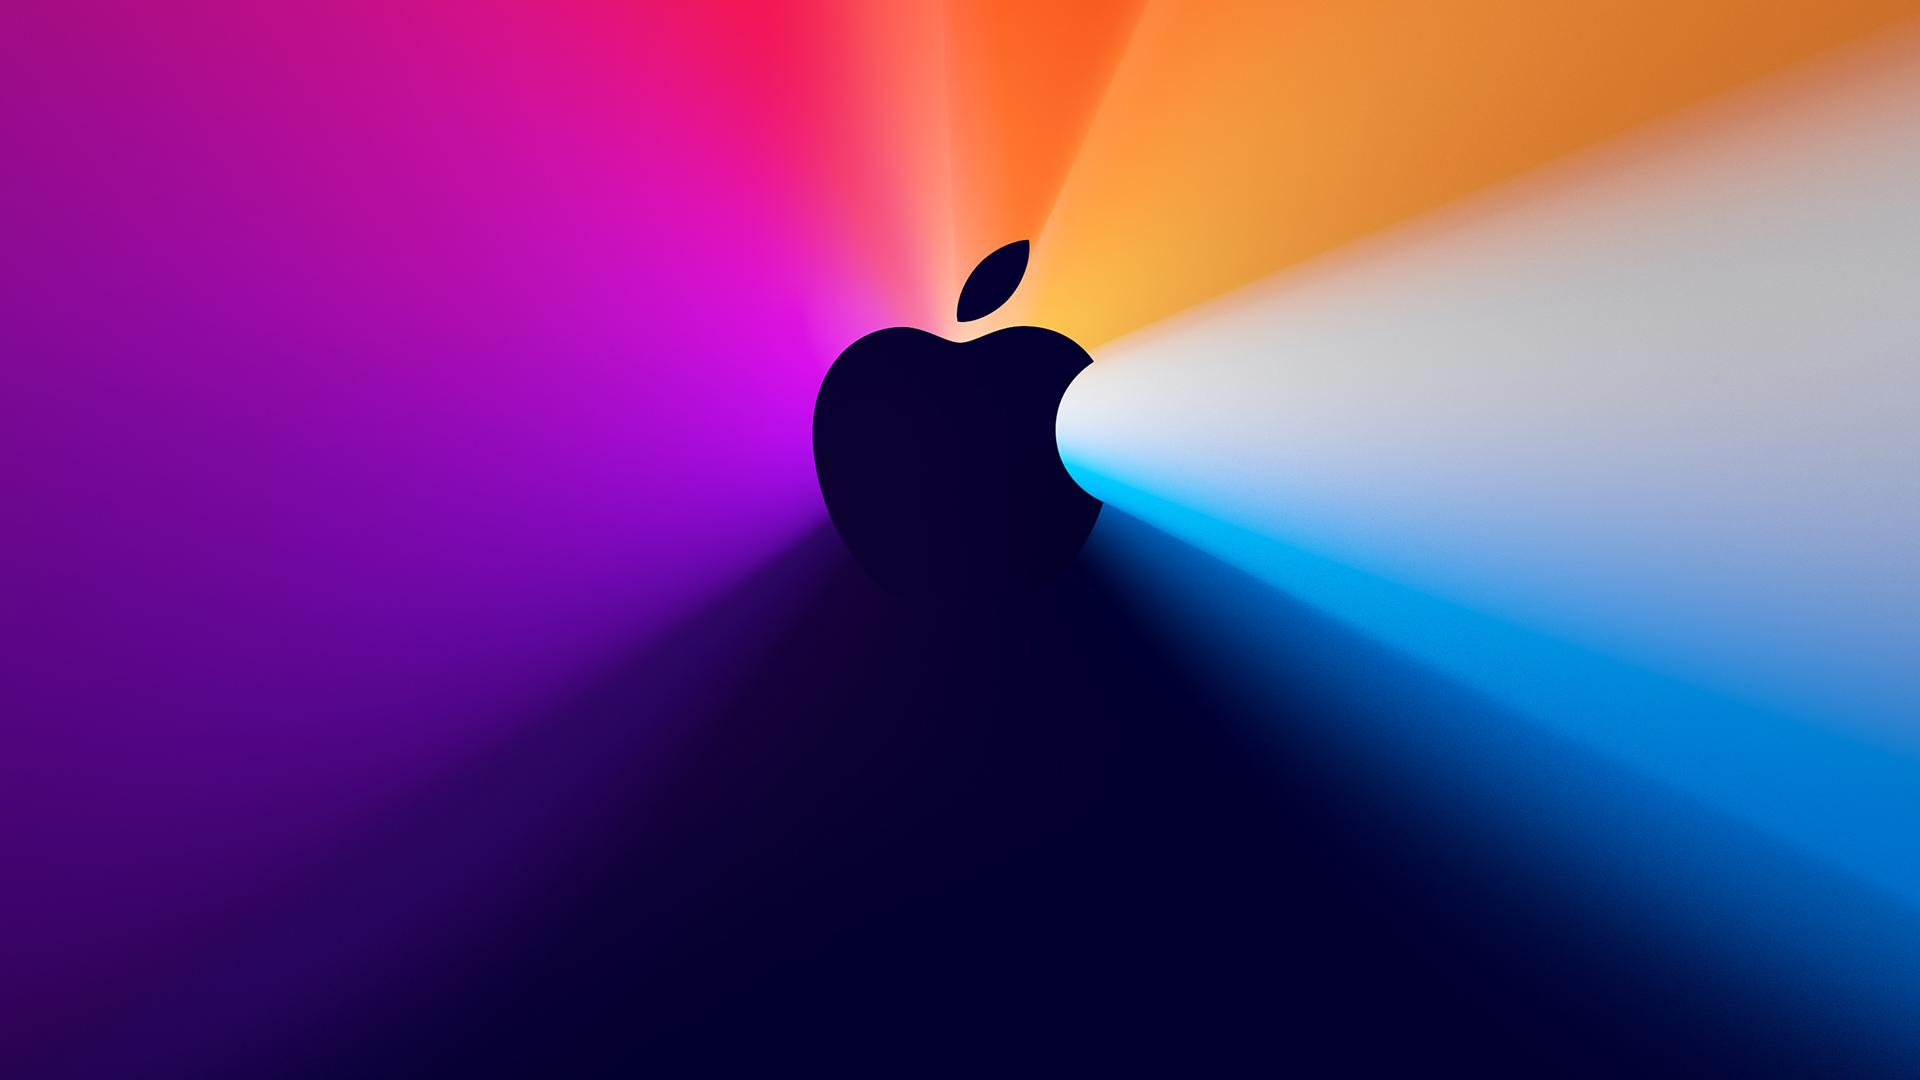 Apple keynote 9th Nov 2020. Image: Apple.